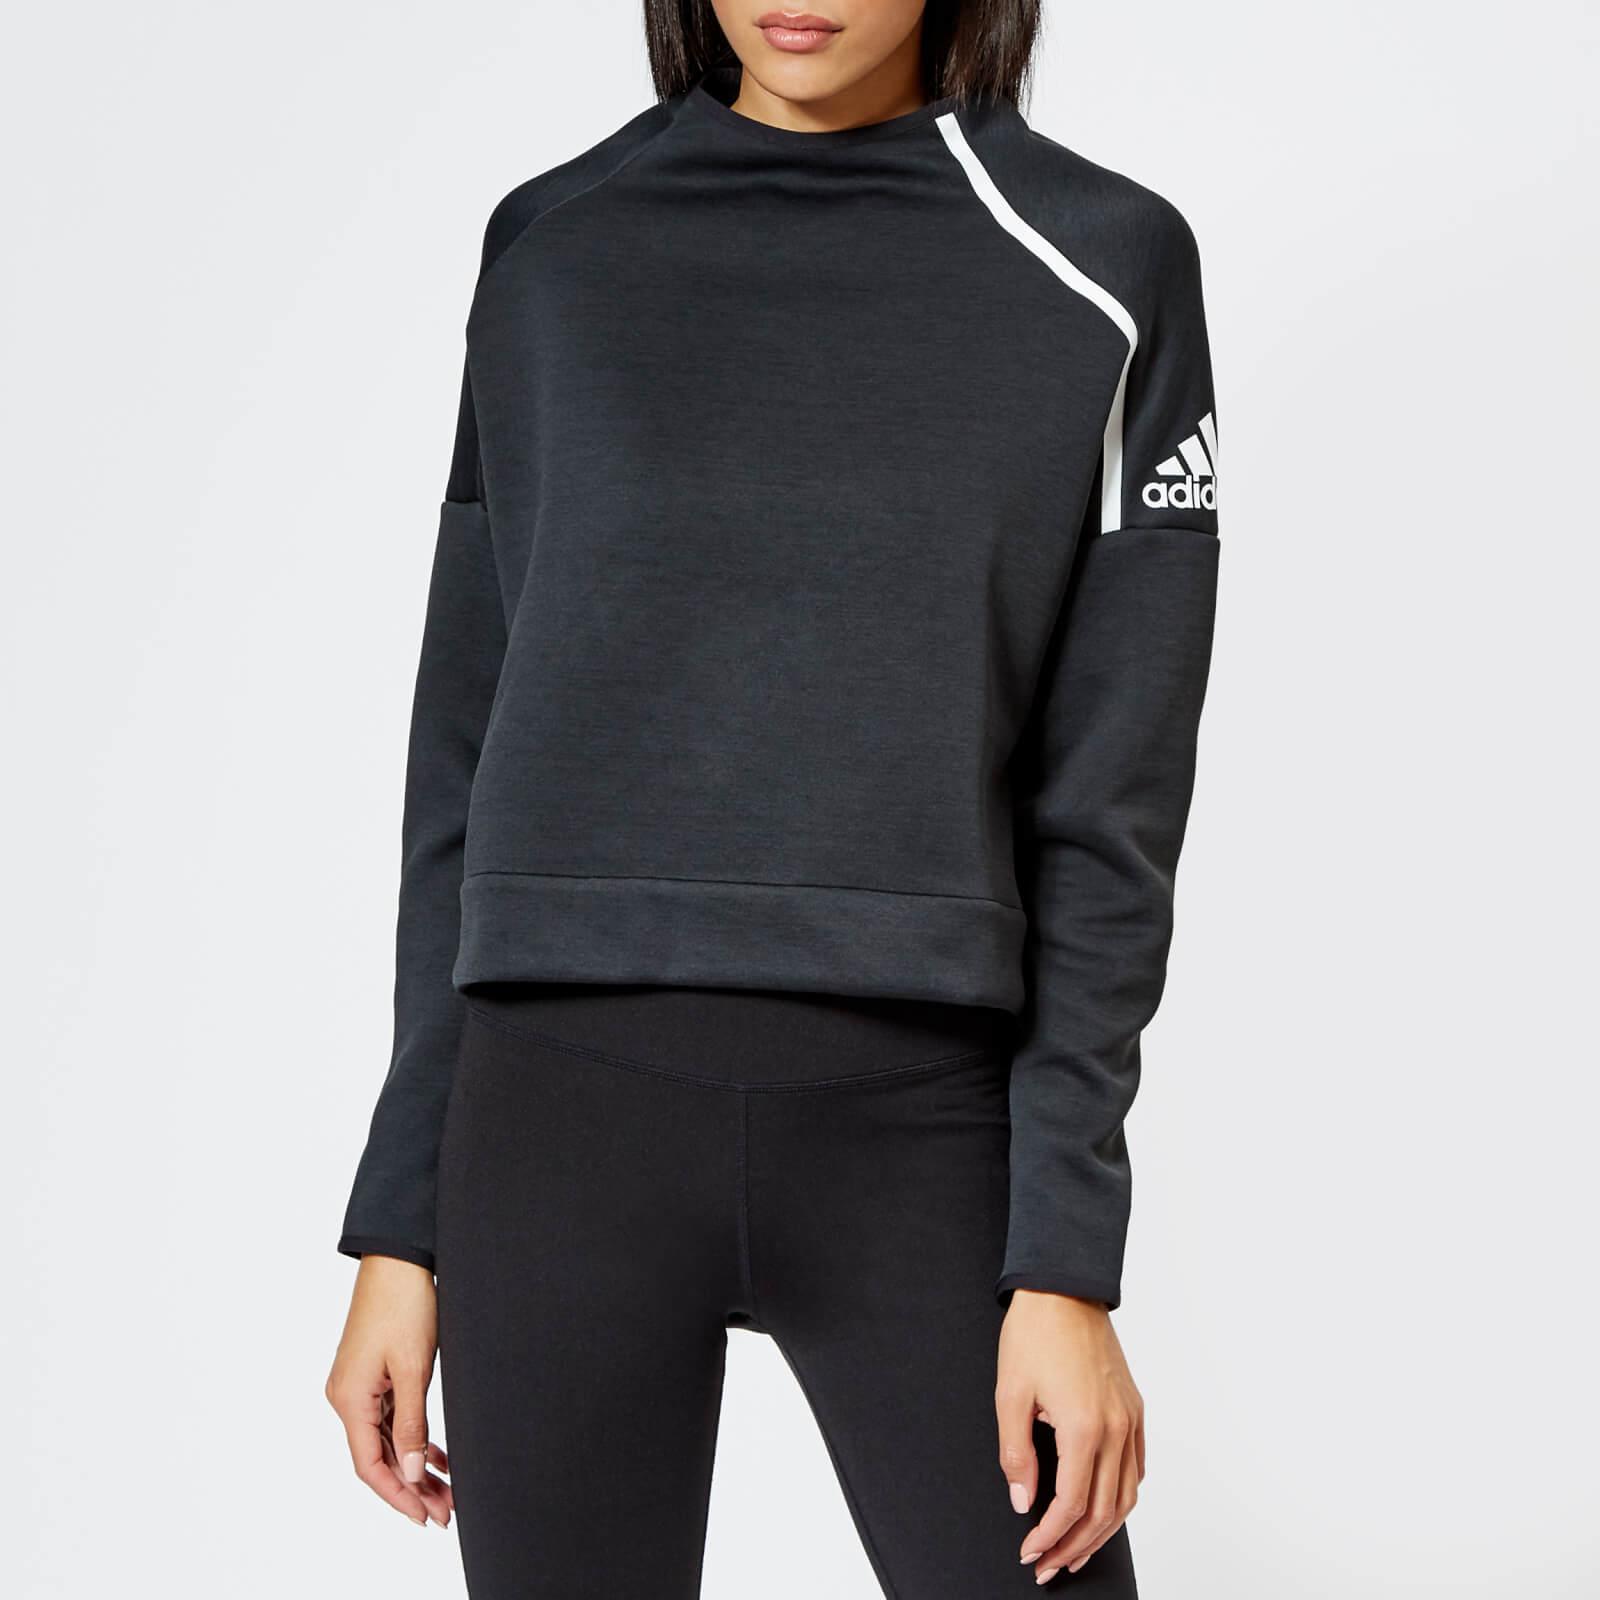 adidas crew neck sweatshirt womens